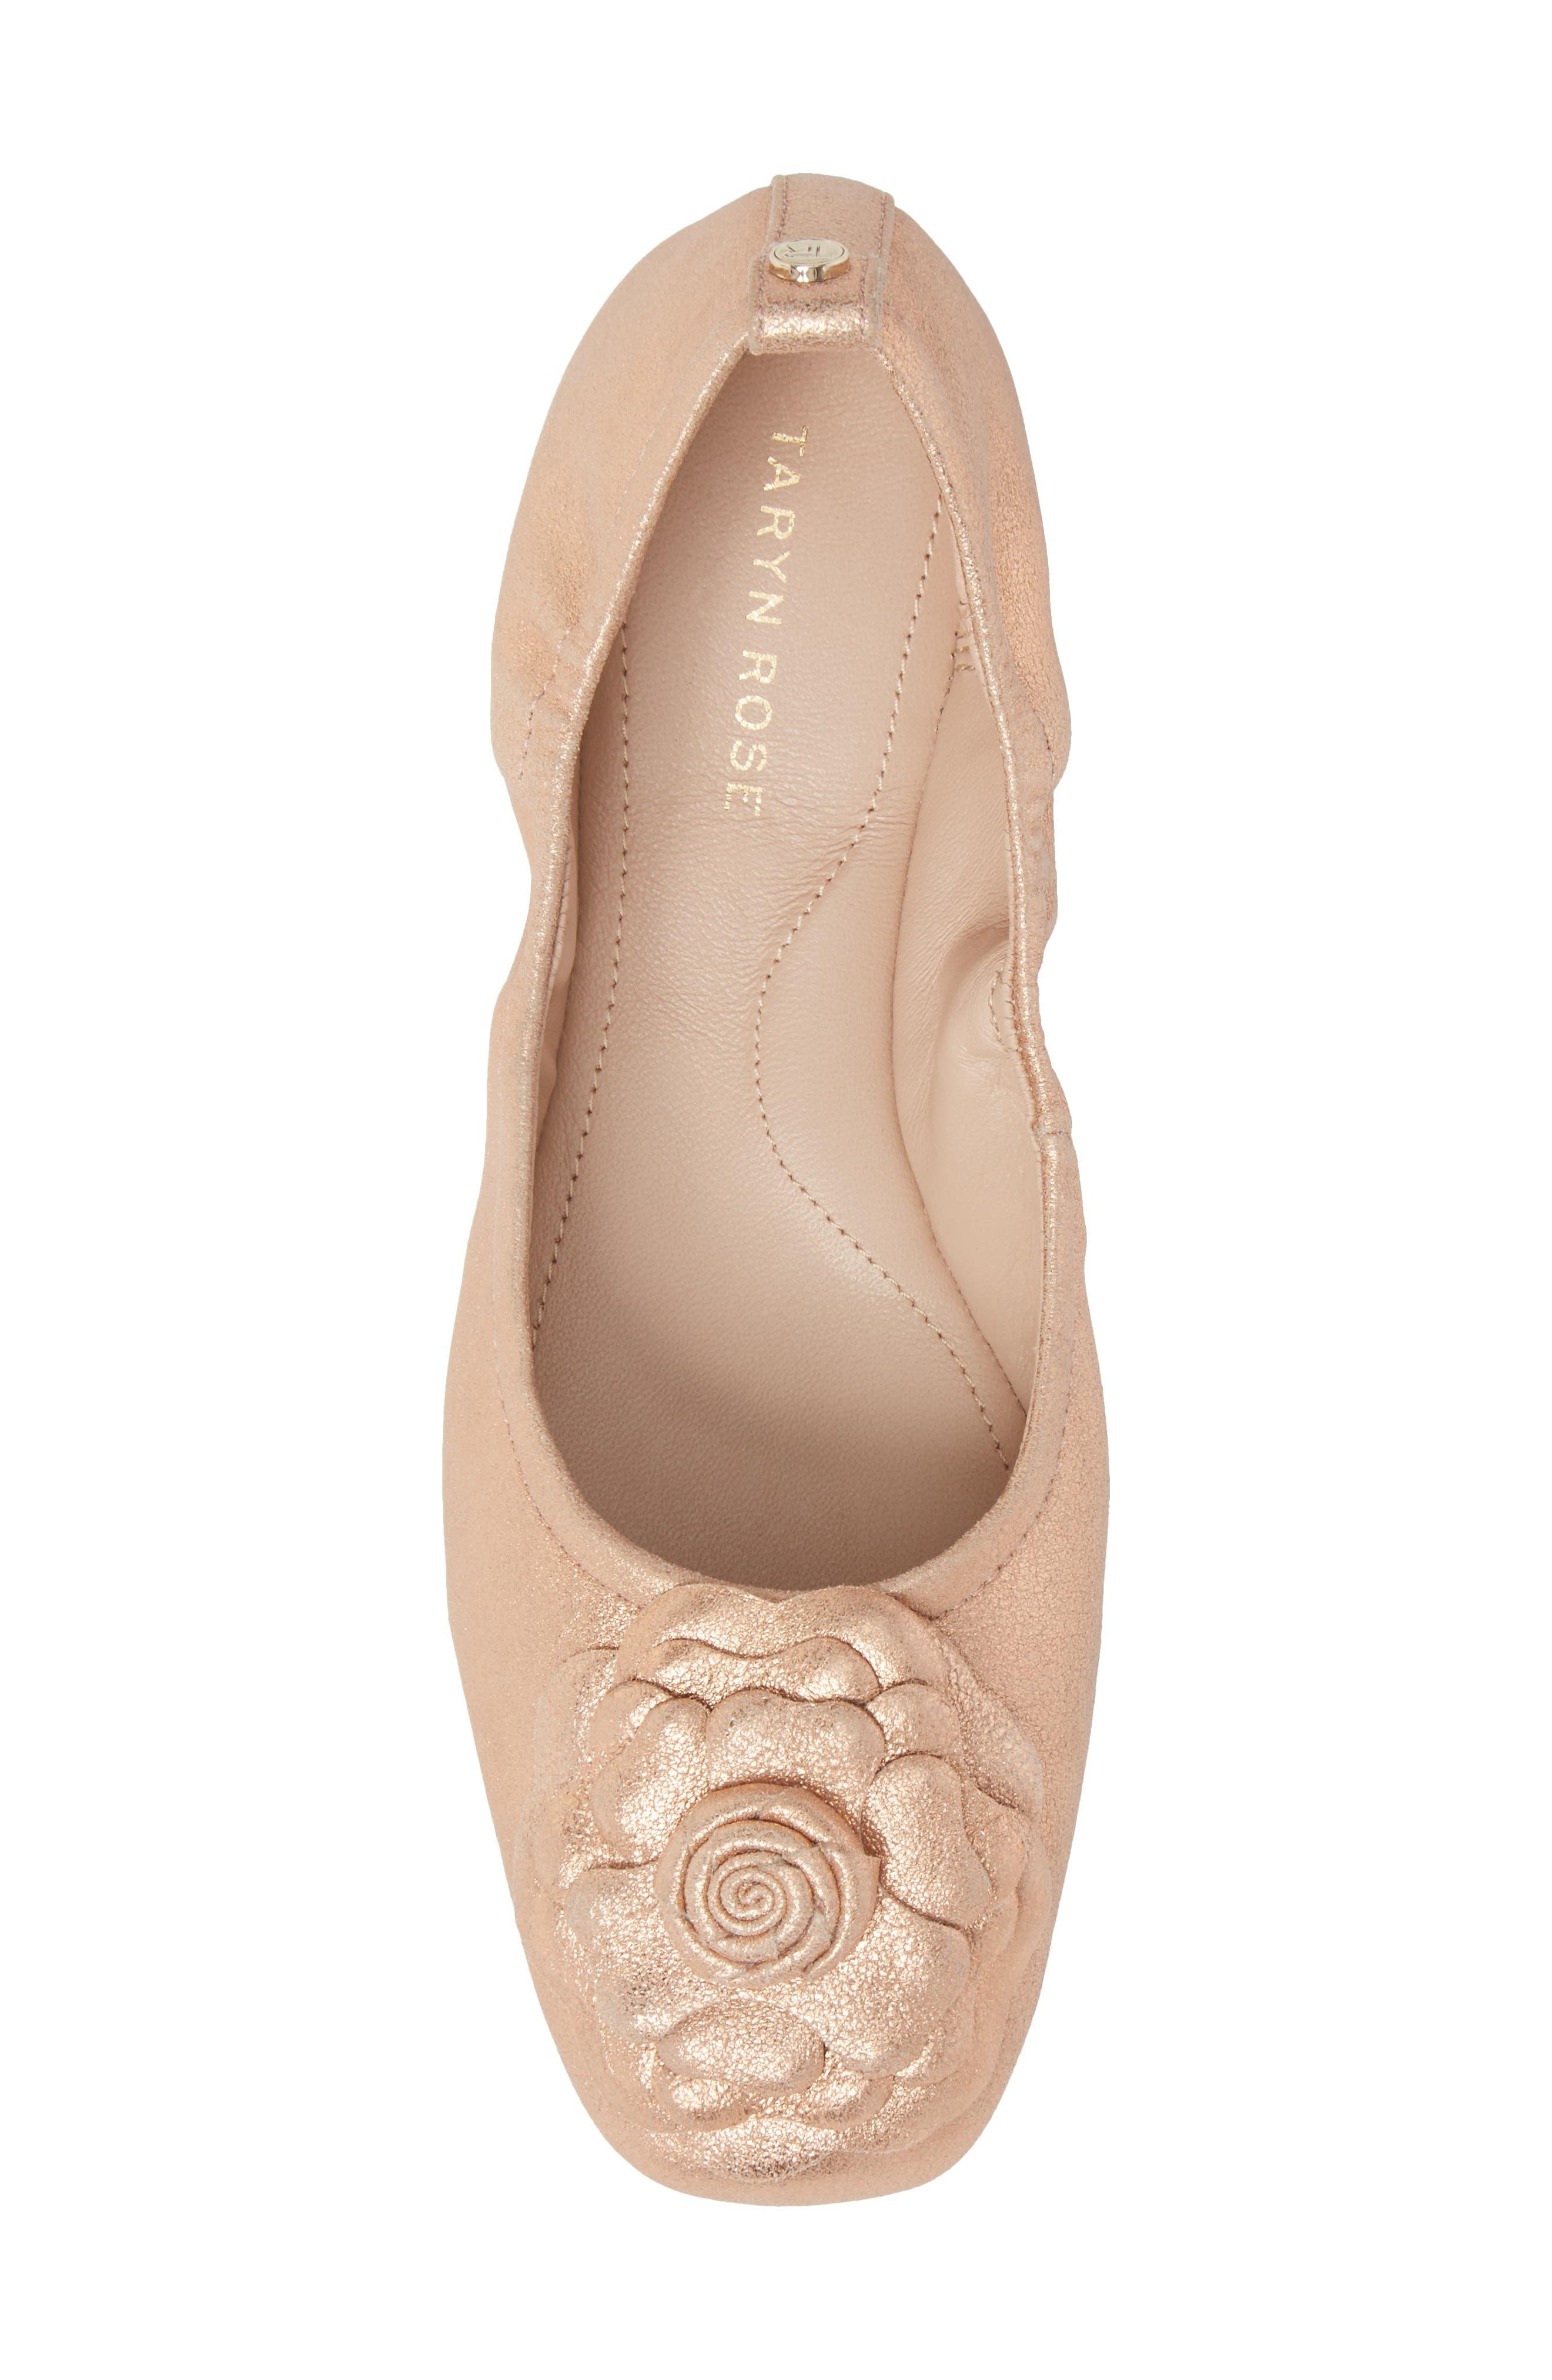 Rosalyn Ballet Flat,                             Alternate thumbnail 4, color,                             Rose Gold Leather